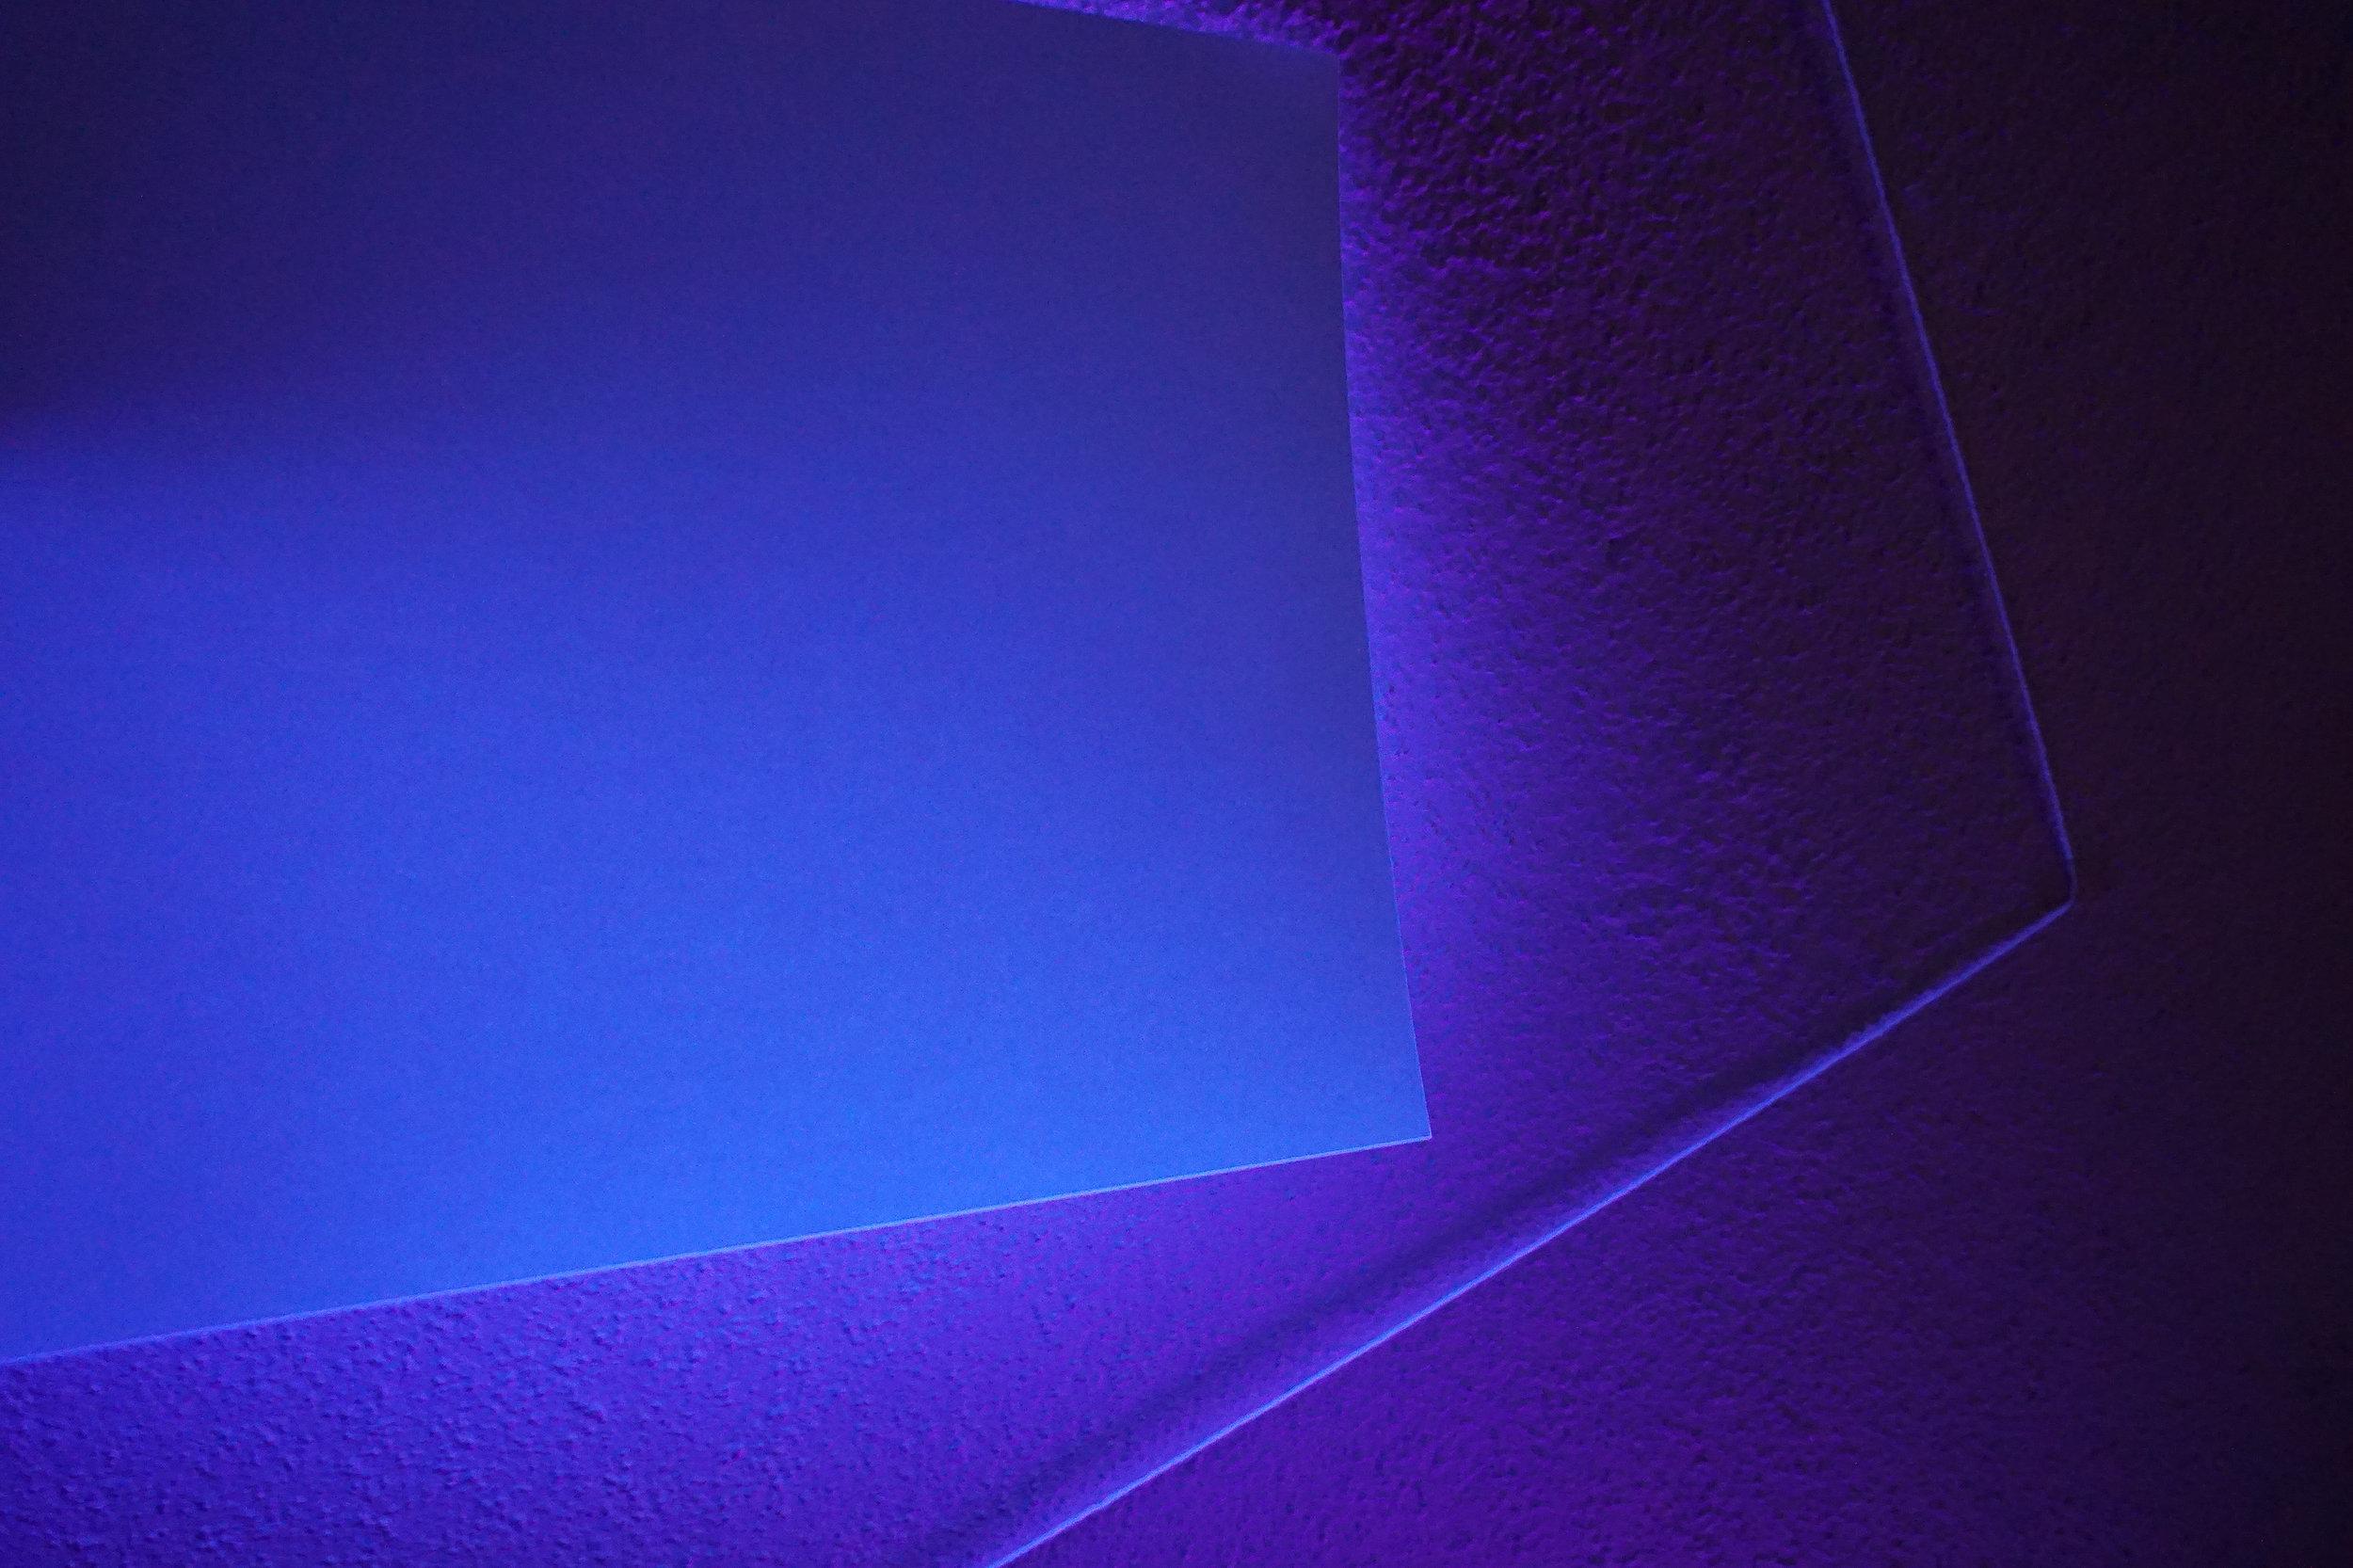 AtelierLandoltPfister_bluebox_03.jpg